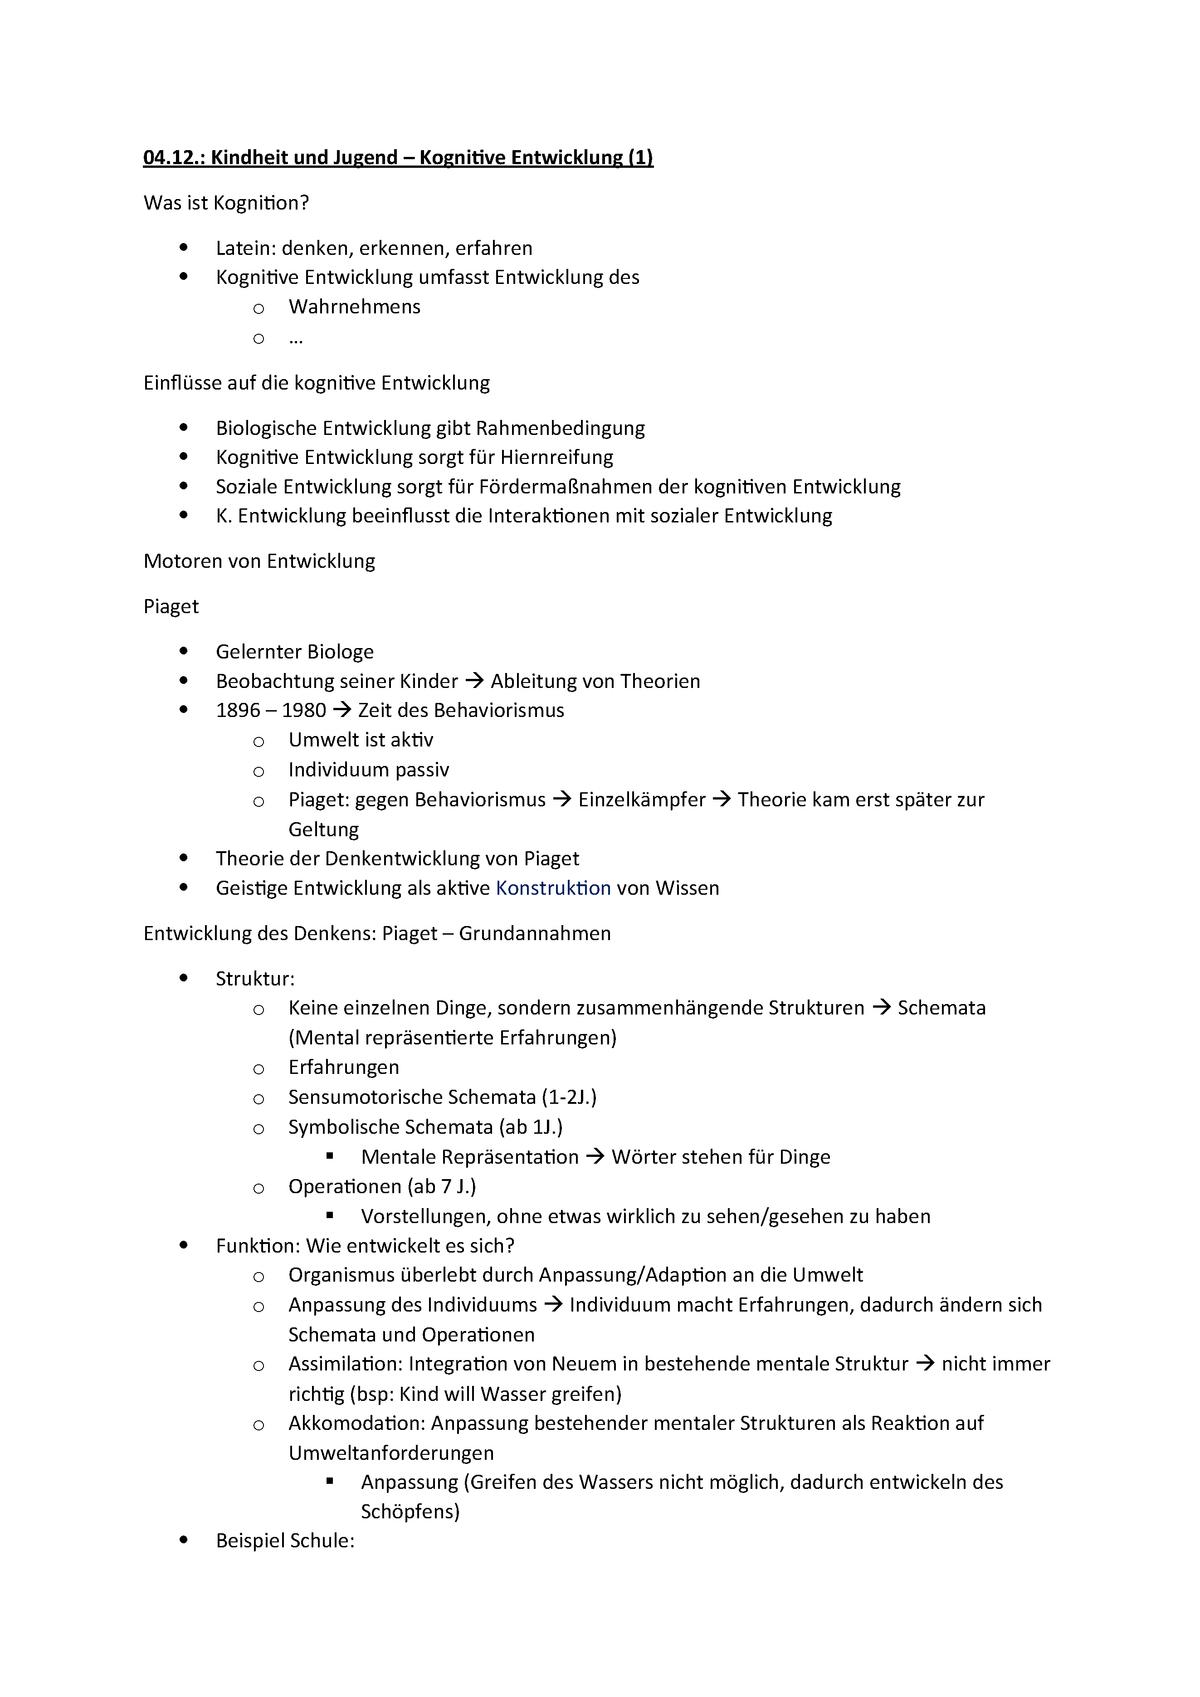 Kognitive Entwicklung - L.052.13001 - Uni Paderborn - Studocu verwandt mit Kognitive Entwicklung Kind Tabelle